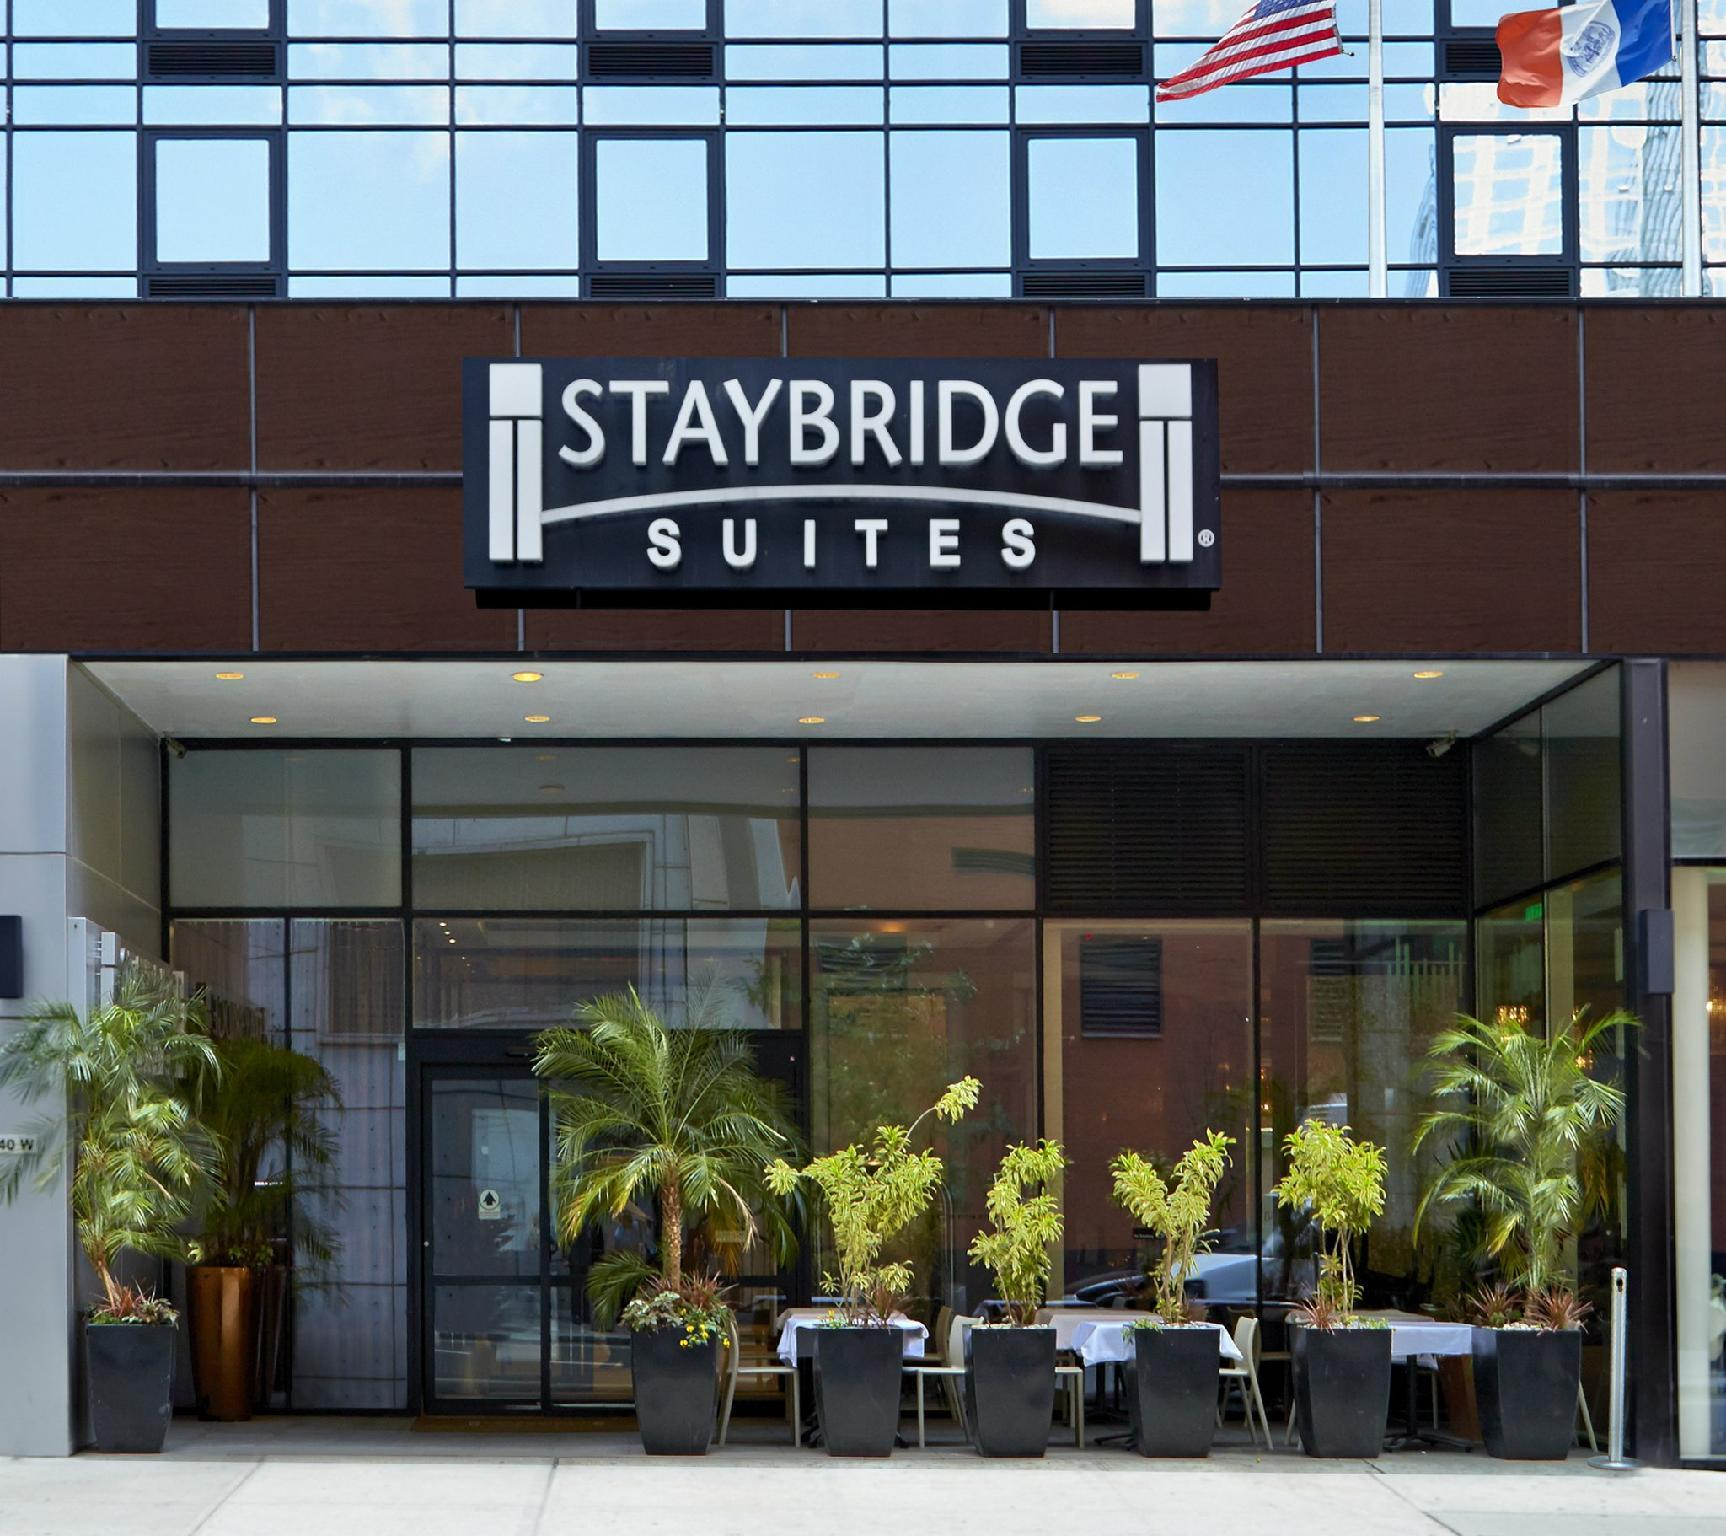 Staybridge Suites   Times Square   New York City